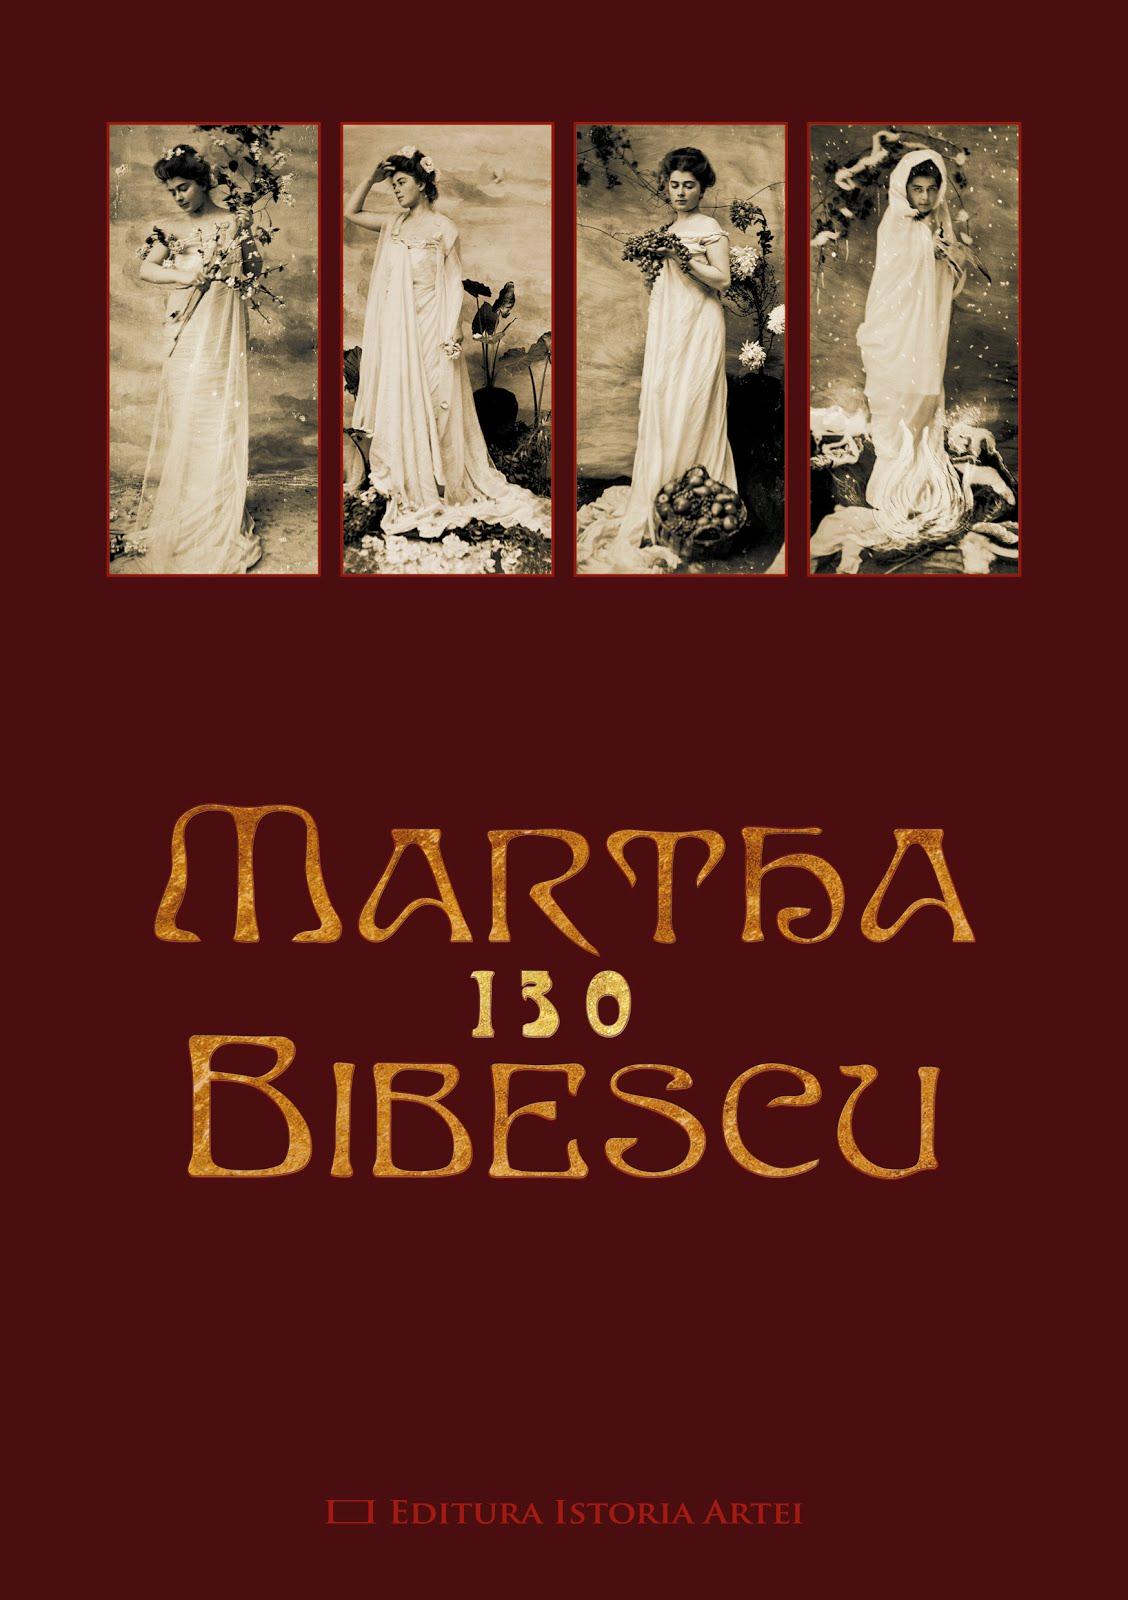 Catalog expoziție Martha Bibescu 130